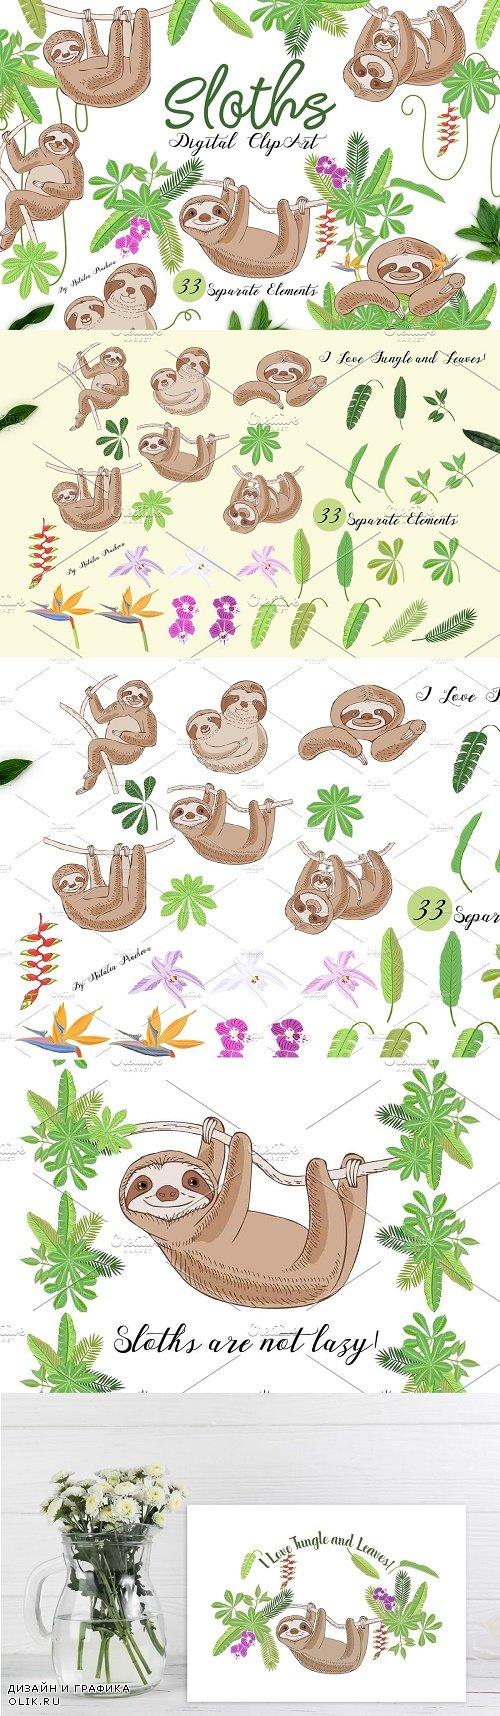 Sloths in Jungle Digital Clipart - 3672942